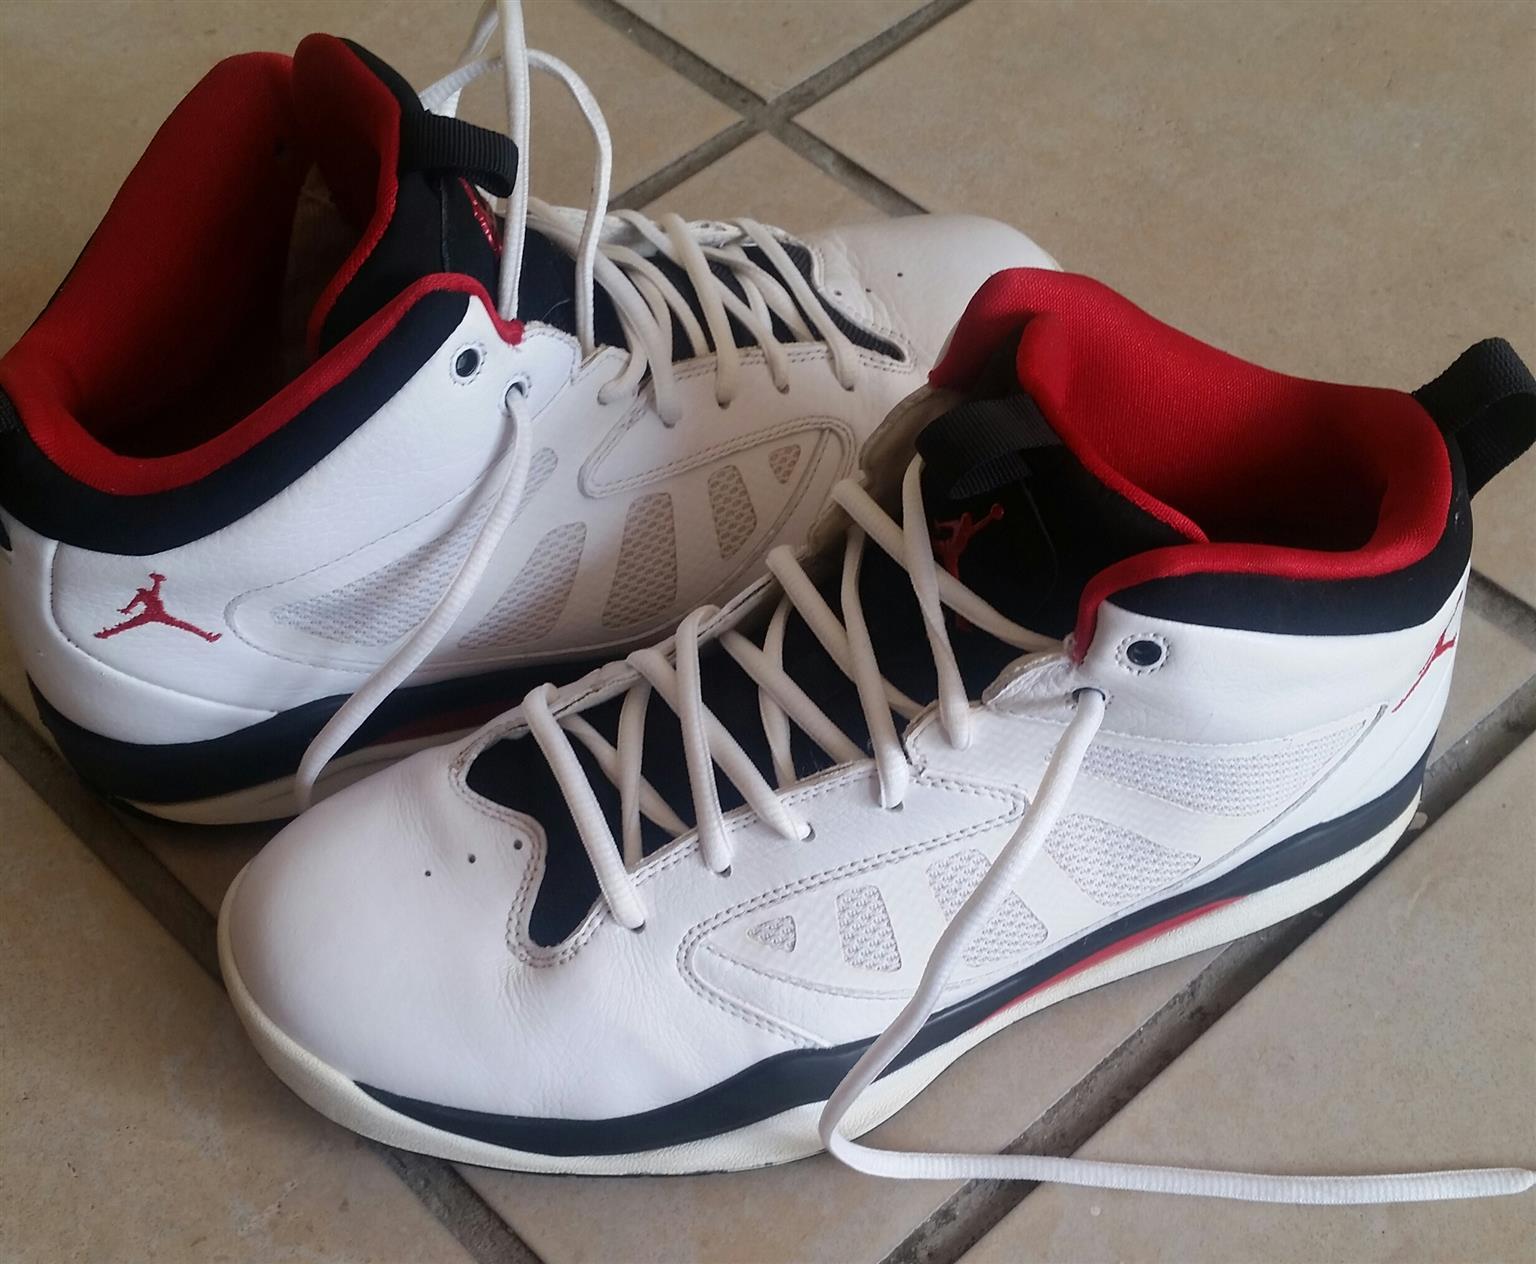 the best attitude 9efd9 cbe40 jordan sneakers in east rand